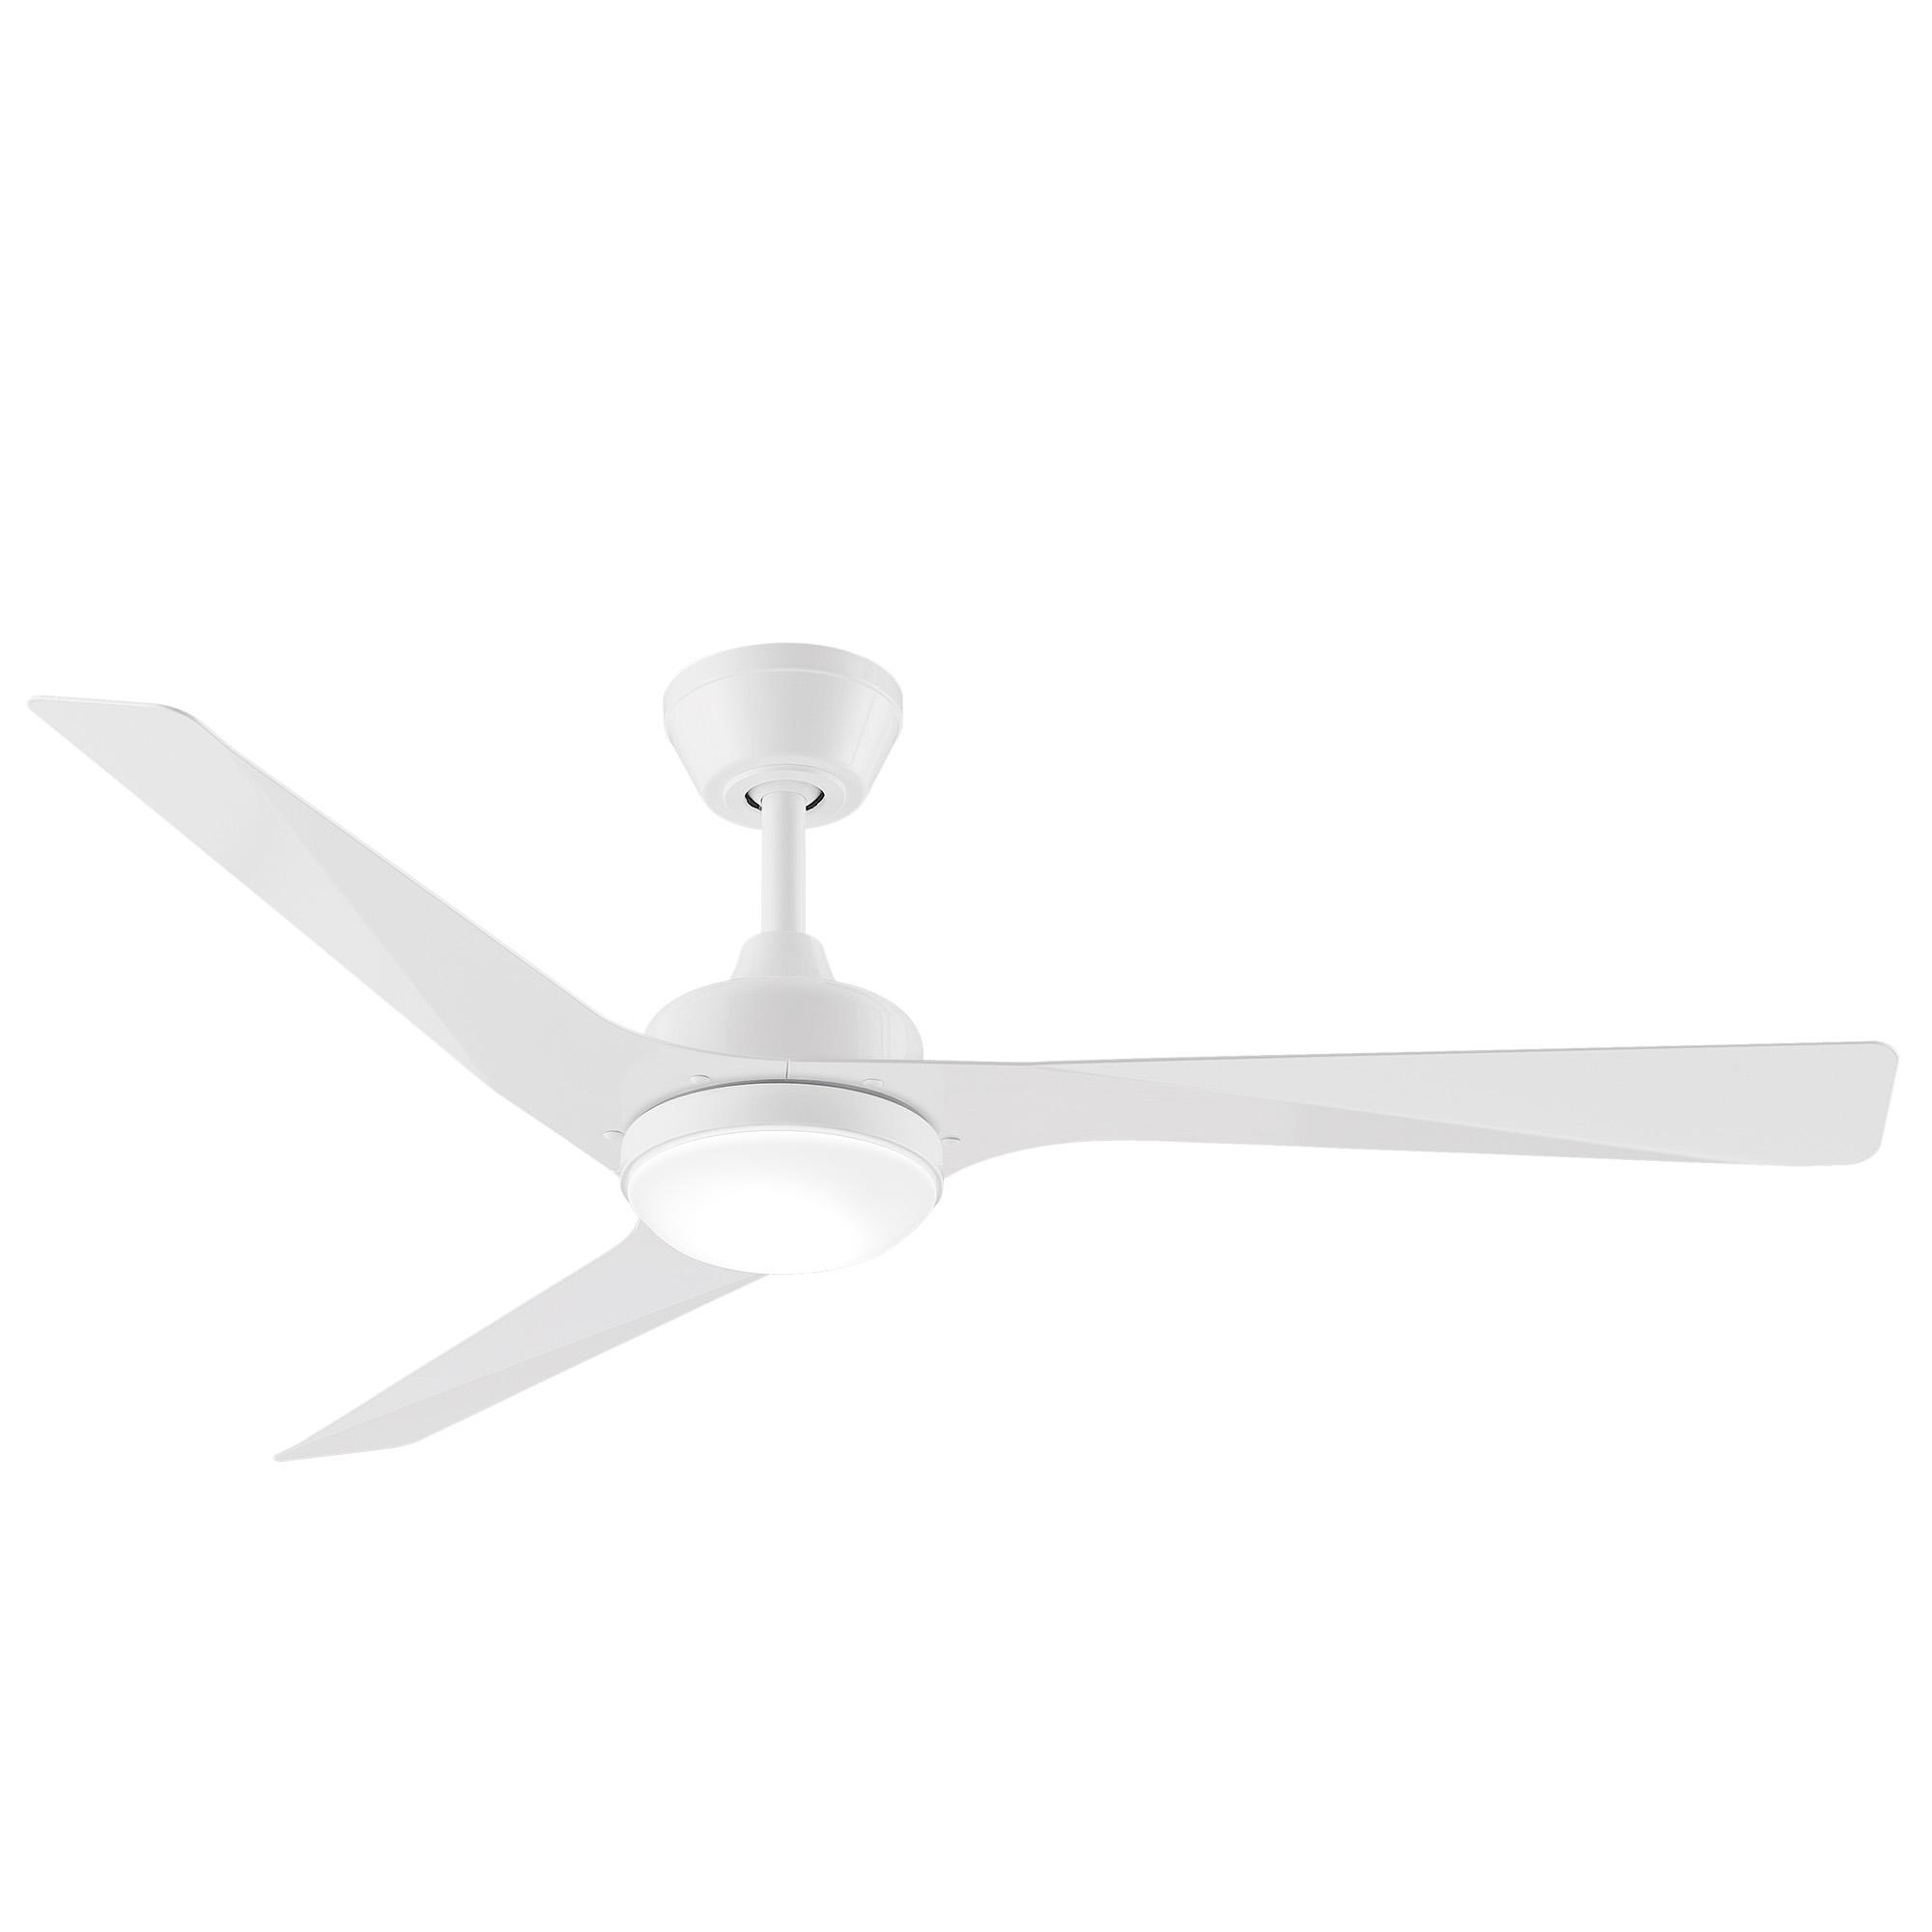 "52"" Modn-3 Ceiling Fan in White with LED Light"